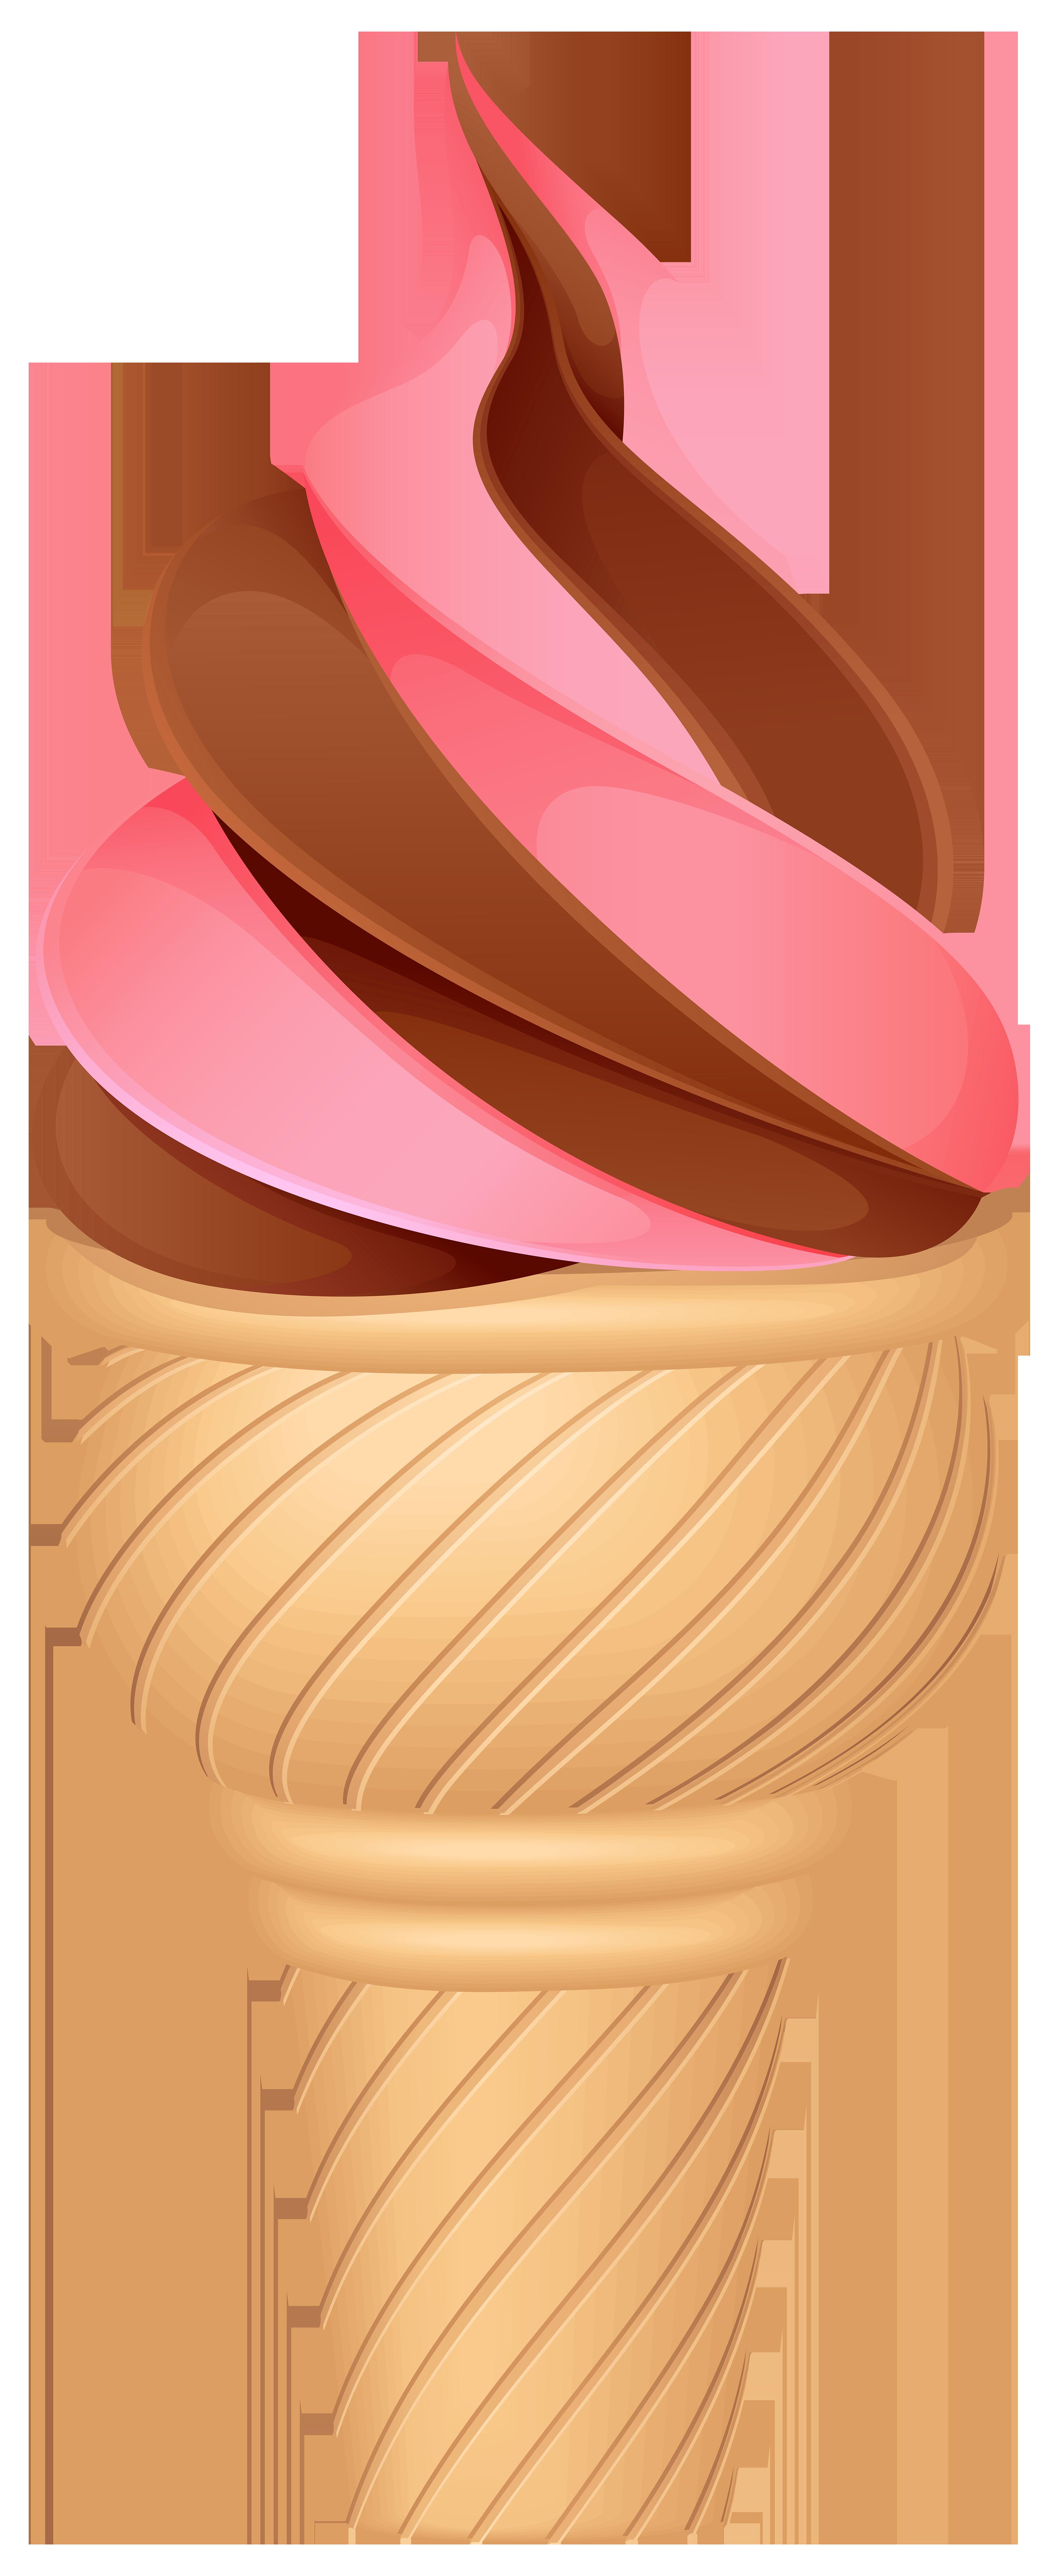 Ice cream png clip. Icecream clipart pink stuff